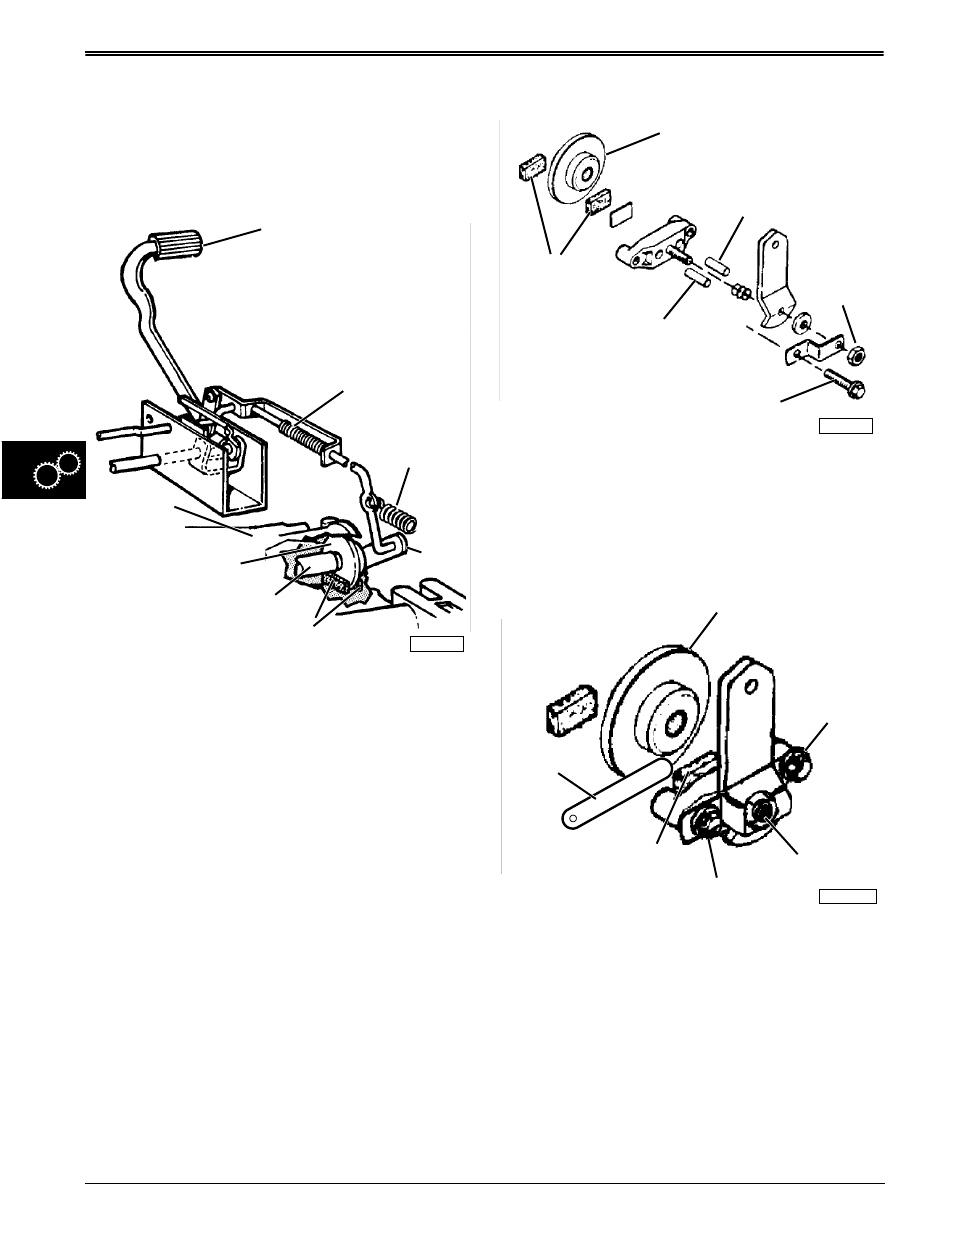 John Deere Starter Wiring Diagram Repair John Deere Stx38 User Manual Page 202 314